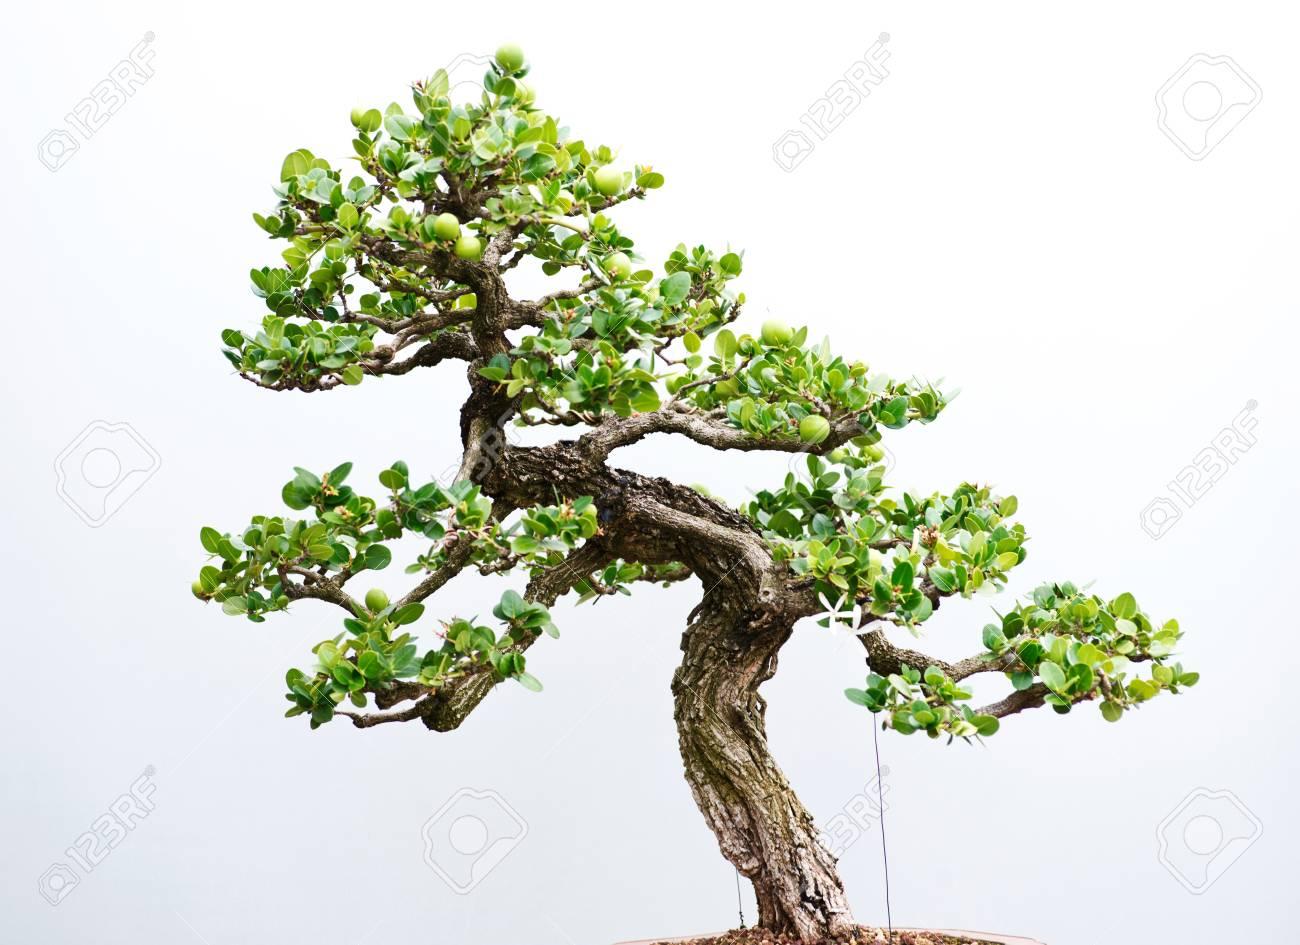 Traditional Bonsai Tree Japanese Art Form Using Trees Grown